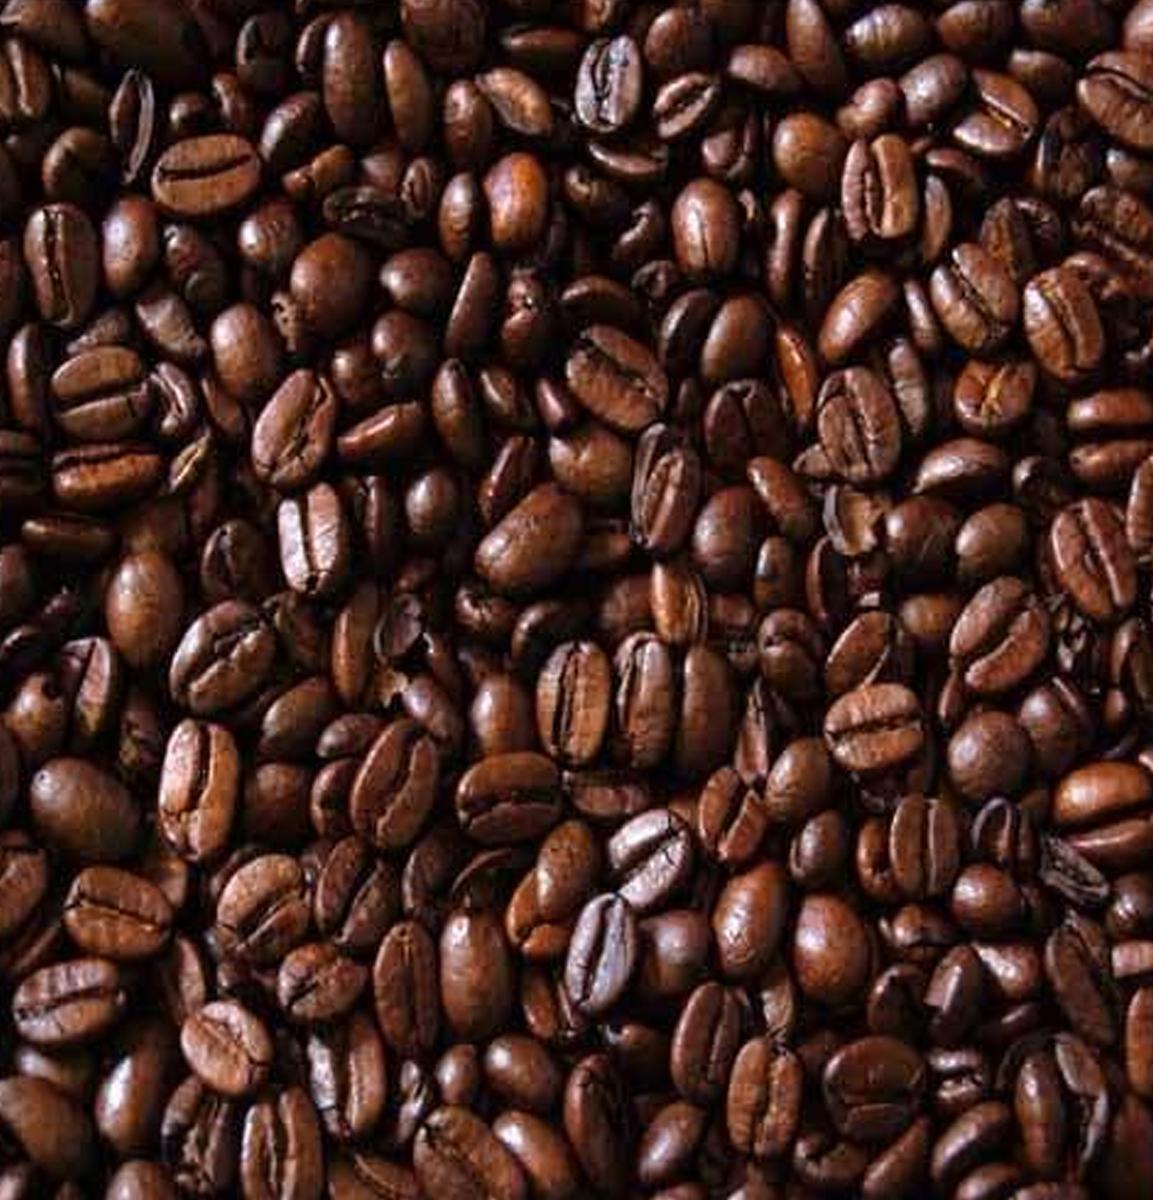 Island Roasted Coffee Beans | The Garlic Farm UK | Isle of ...